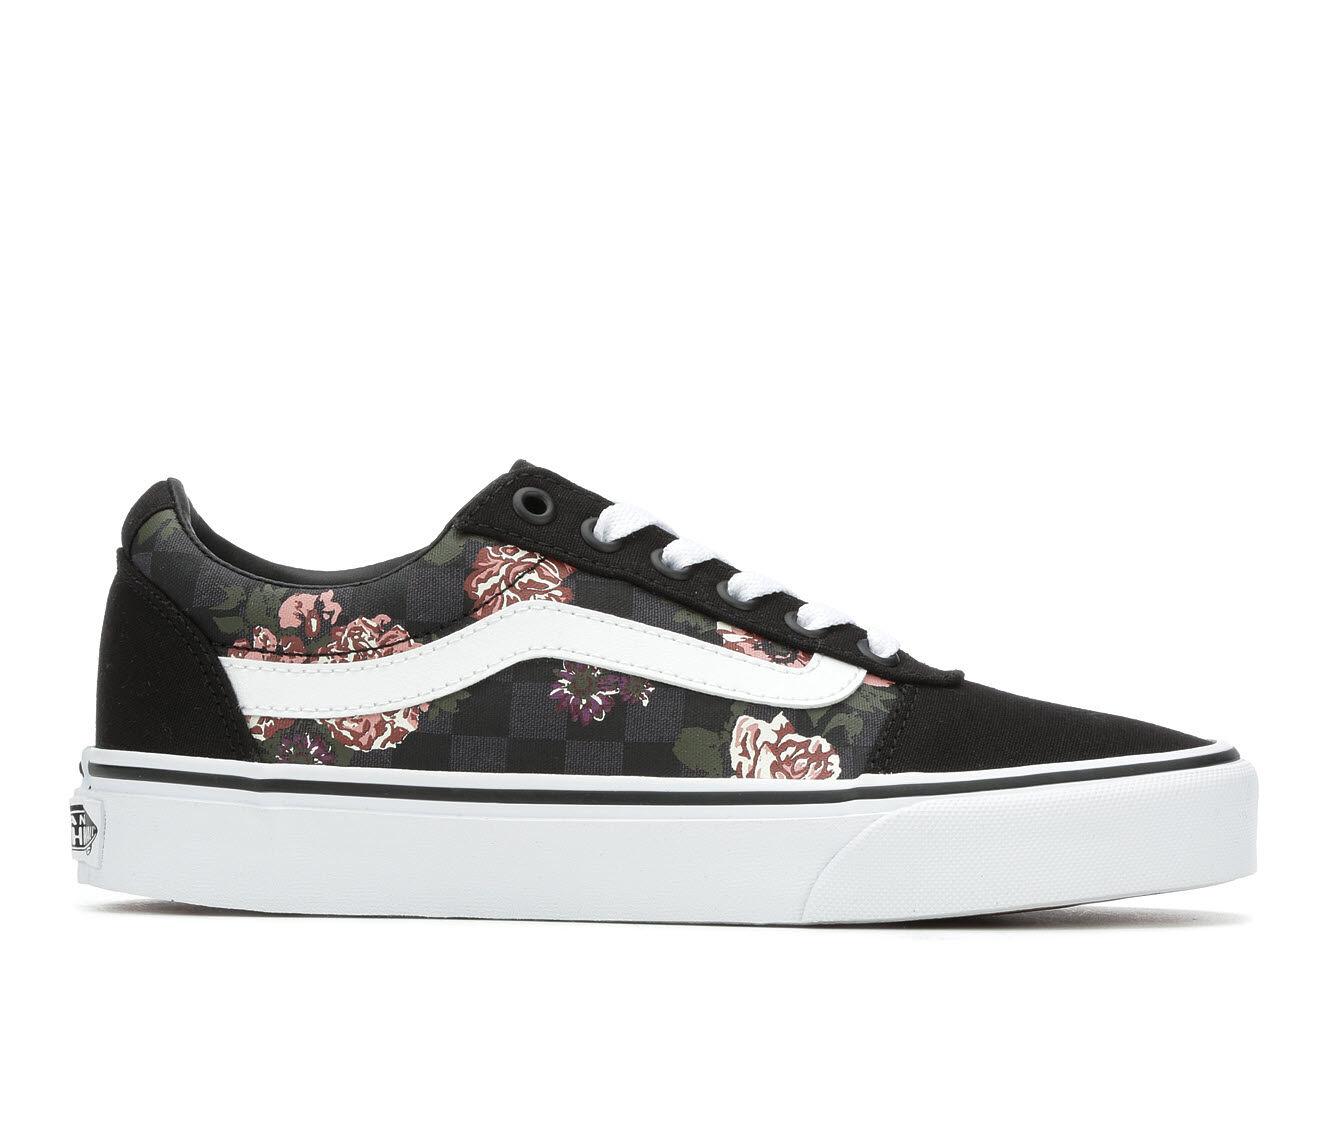 Women's Vans Ward Floral Check Skate